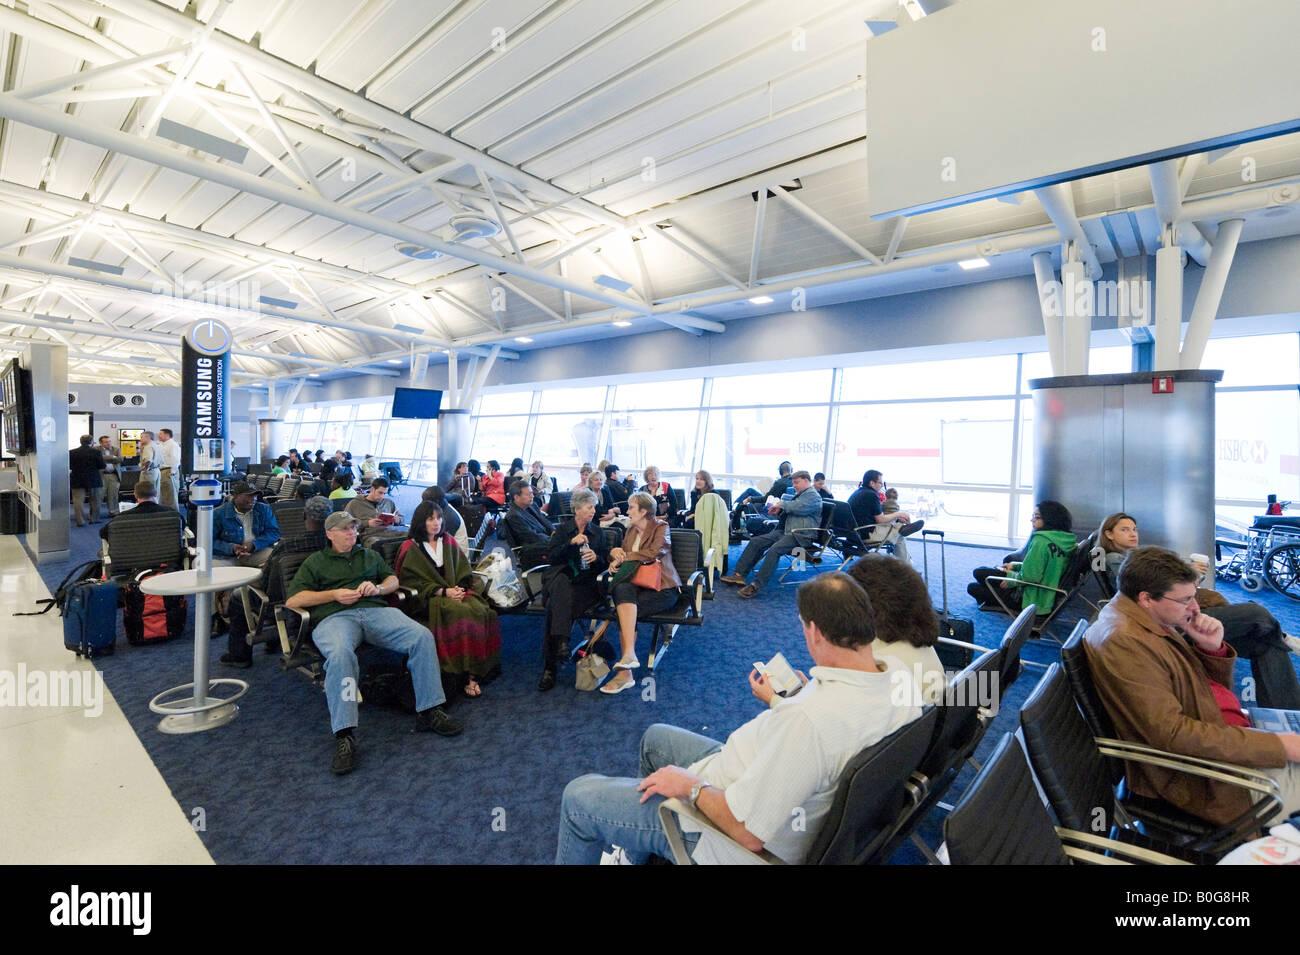 Departure Gate in American Airlines Terminal 8, JFK Airport, New York - Stock Image